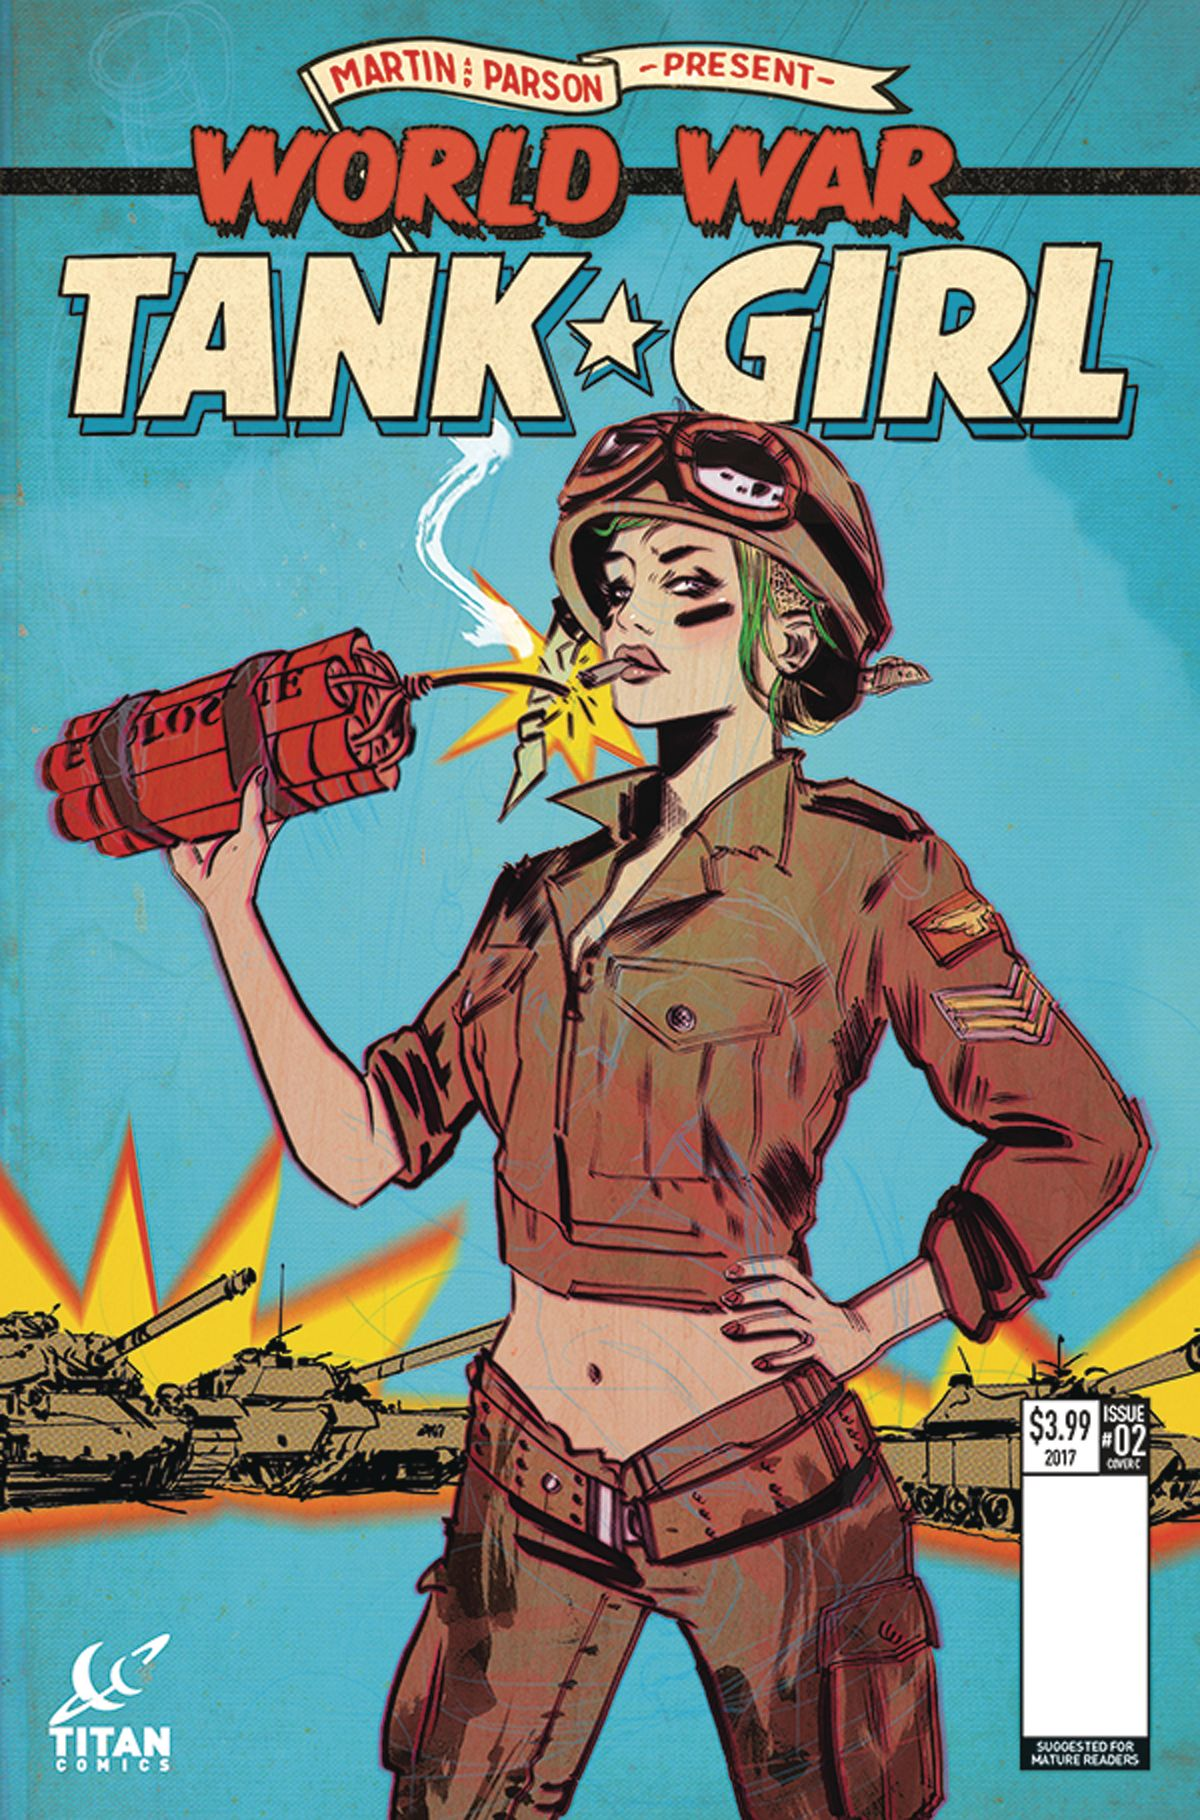 TANK GIRL WORLD WAR TANK GIRL #2 (OF 4) CVR C LOTAY | Other Comic